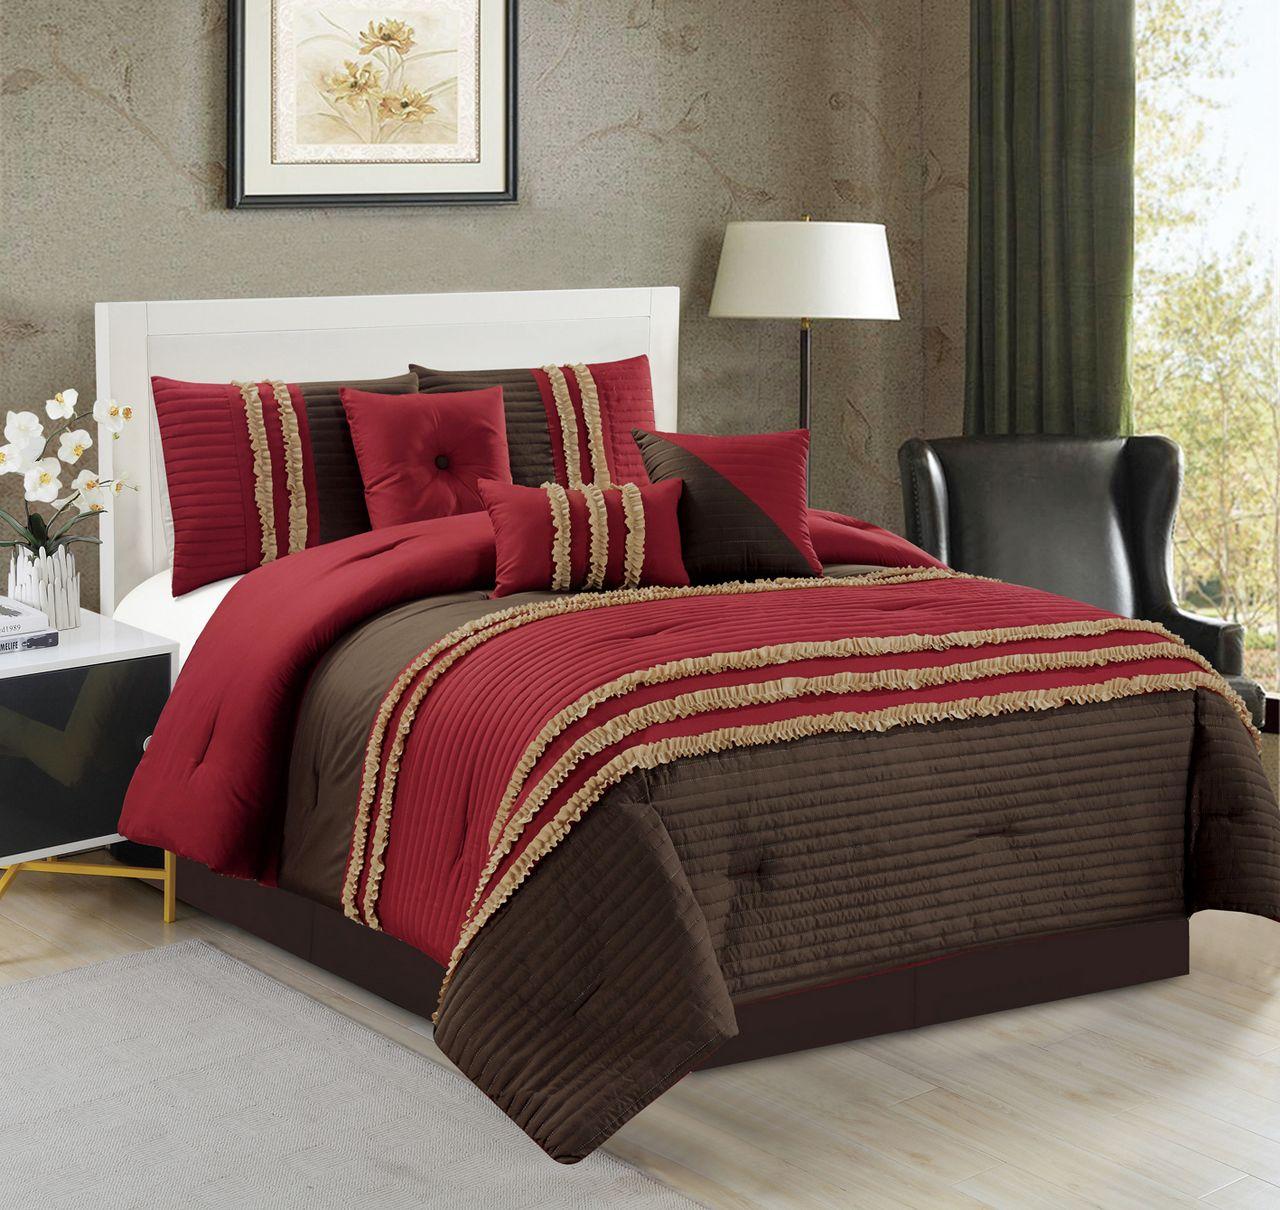 7 Piece Ruched Pleat Comforter Set